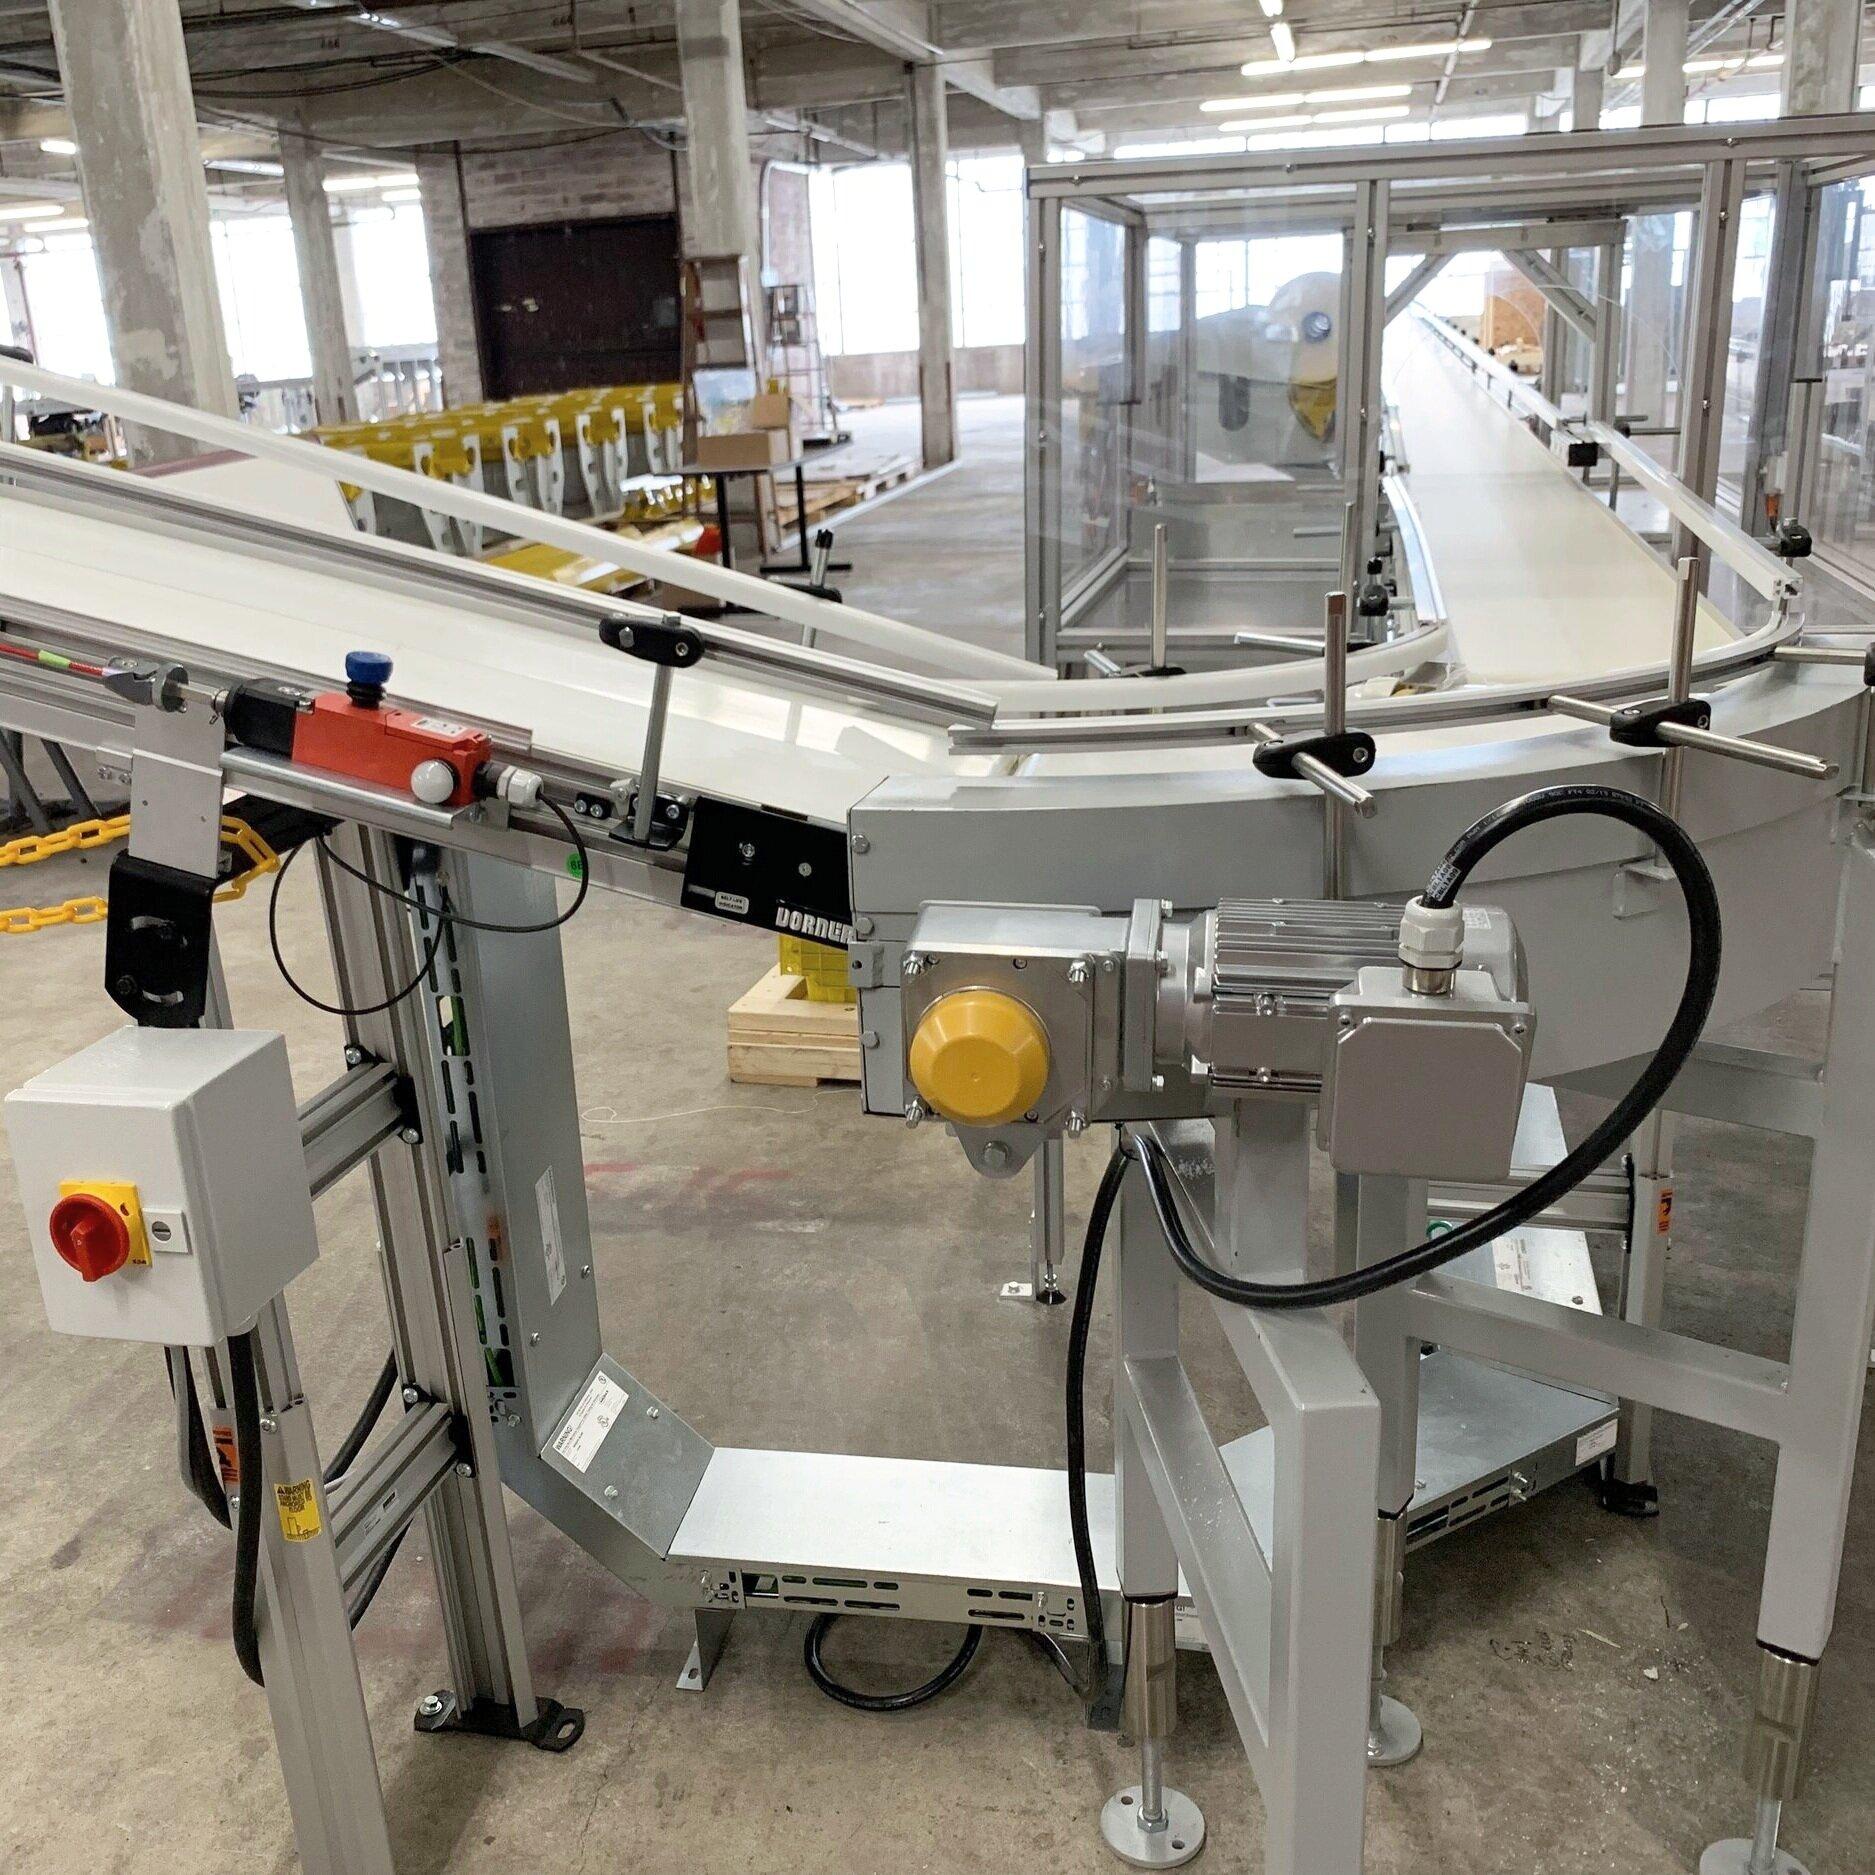 Process-Automation_conveyor_inspect_Fitz-Thors-Engineering_Birmingham-Alabama.JPG